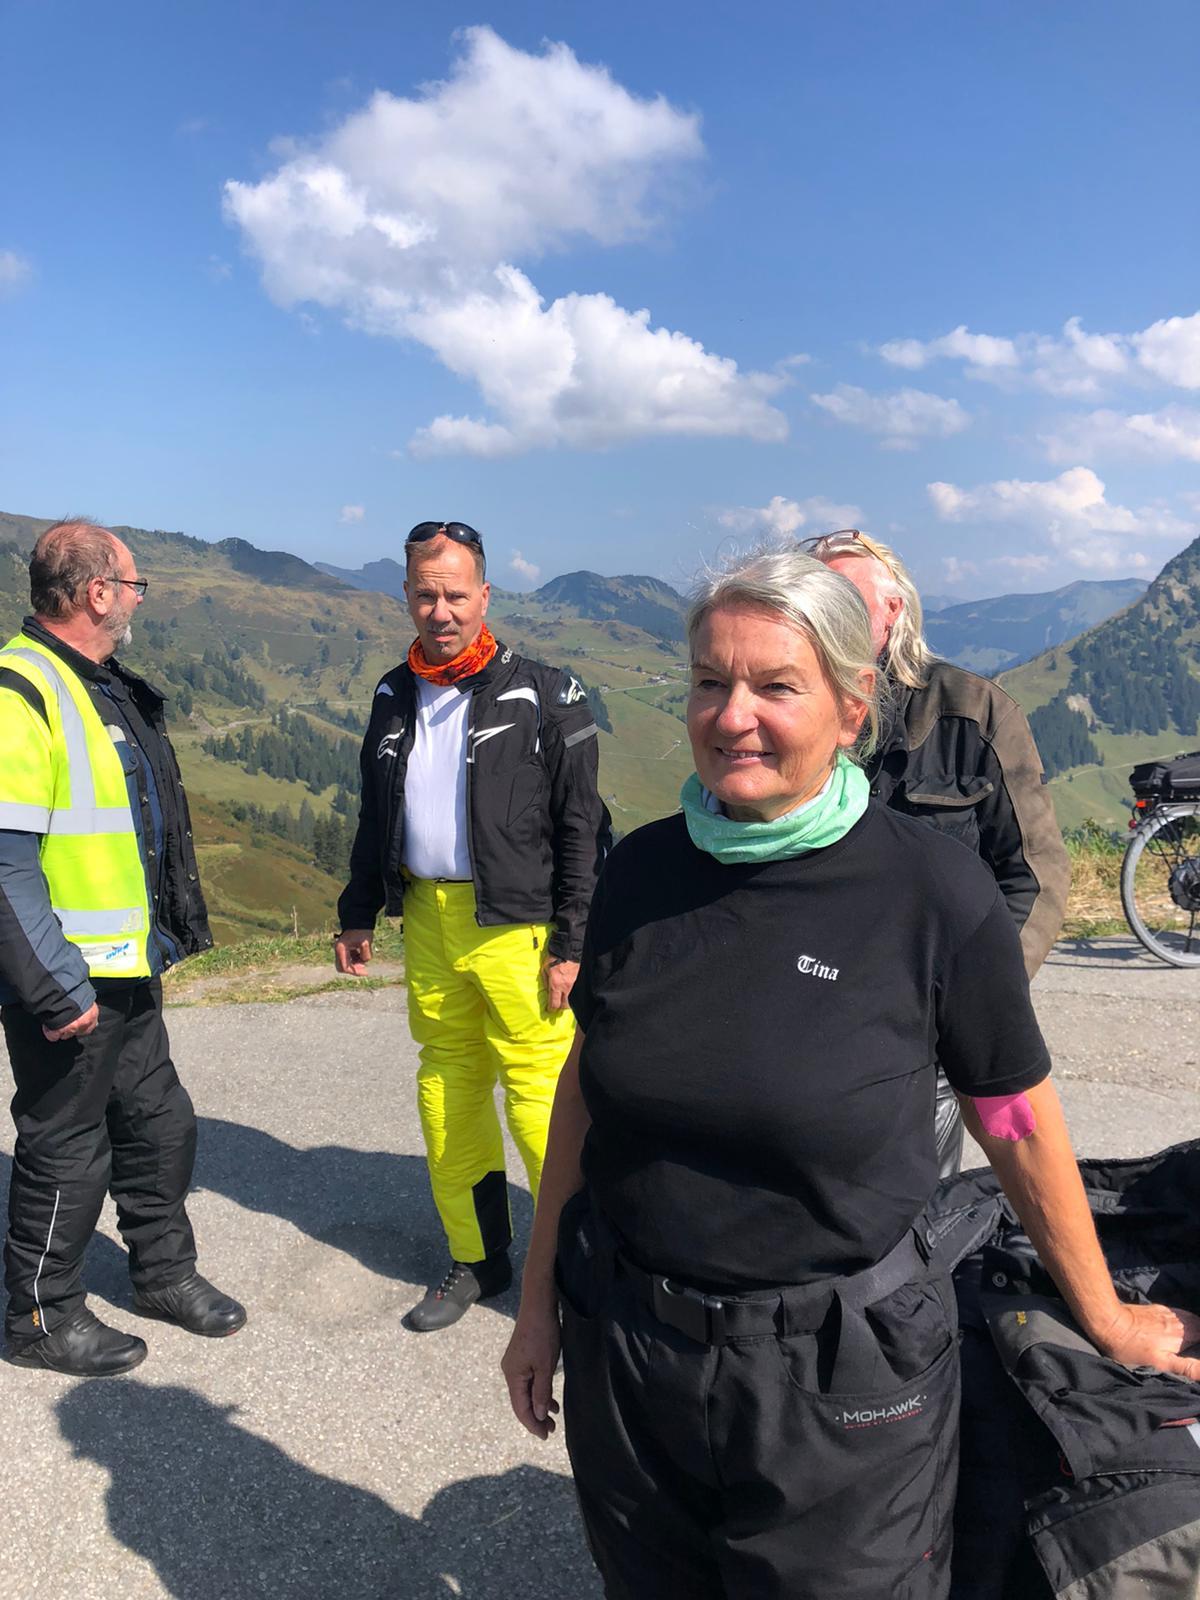 v.L.n.R. Hade, Spätzle.de und Tina